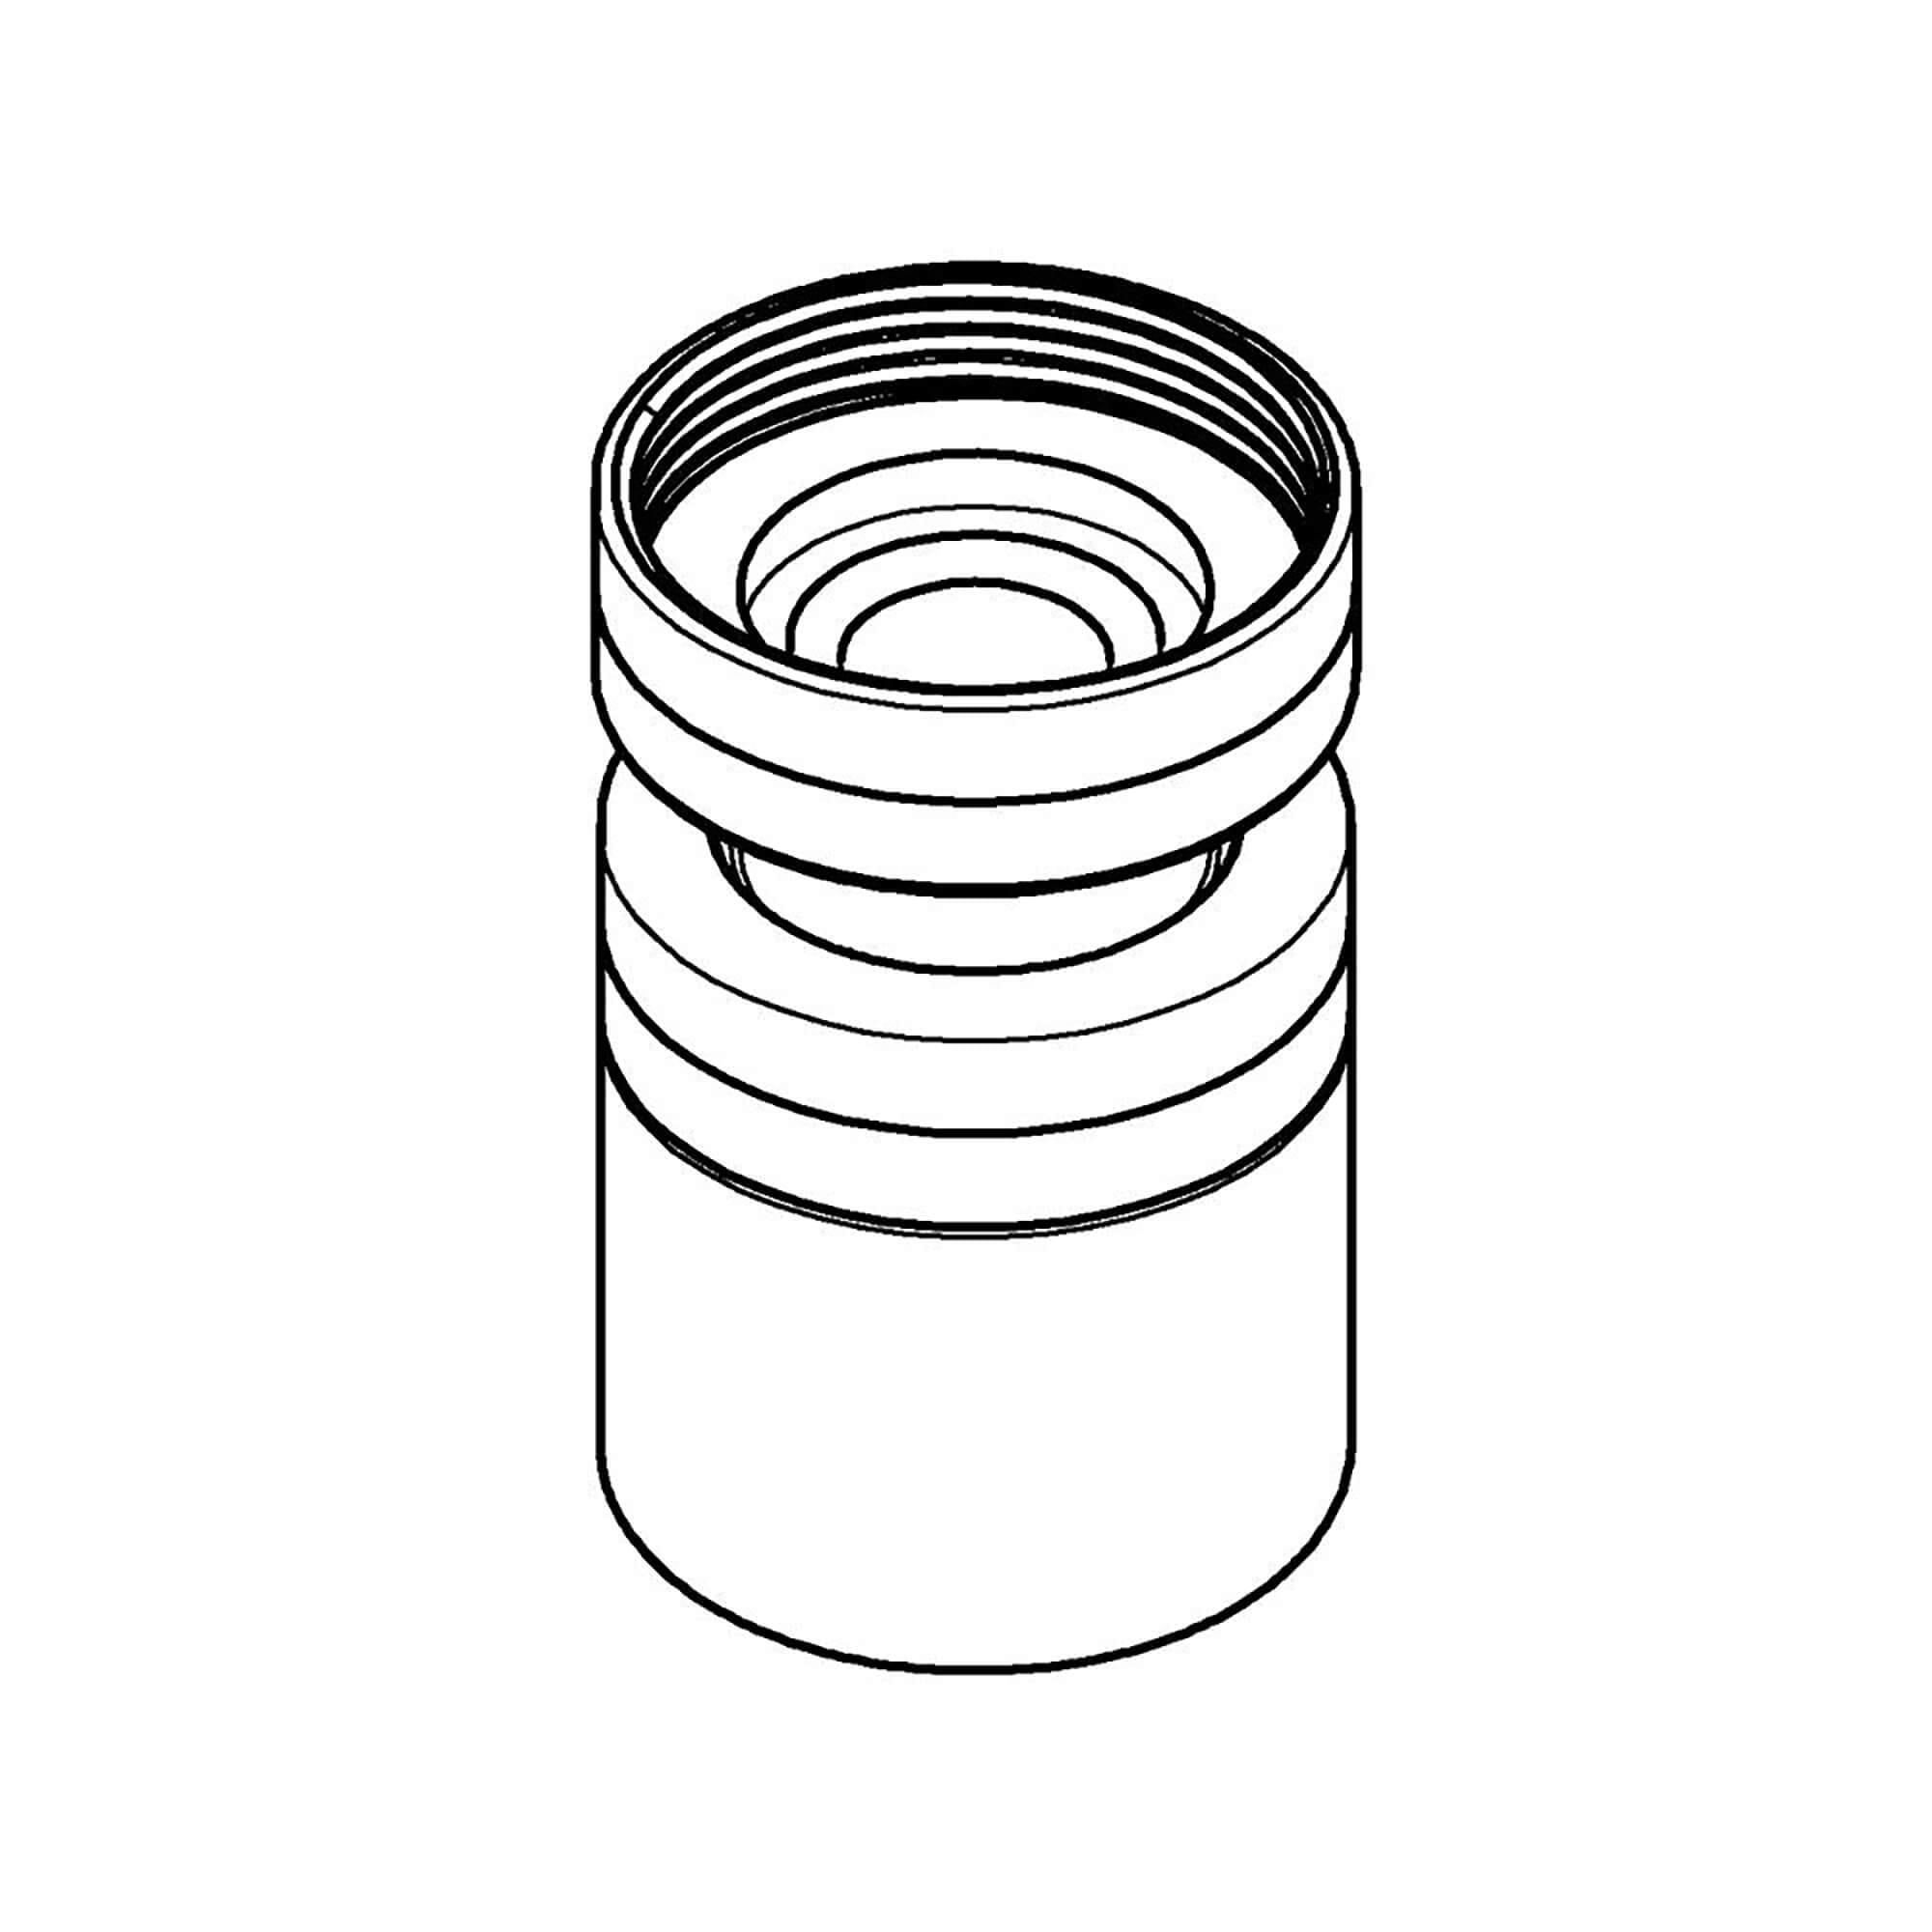 ball joint aerator